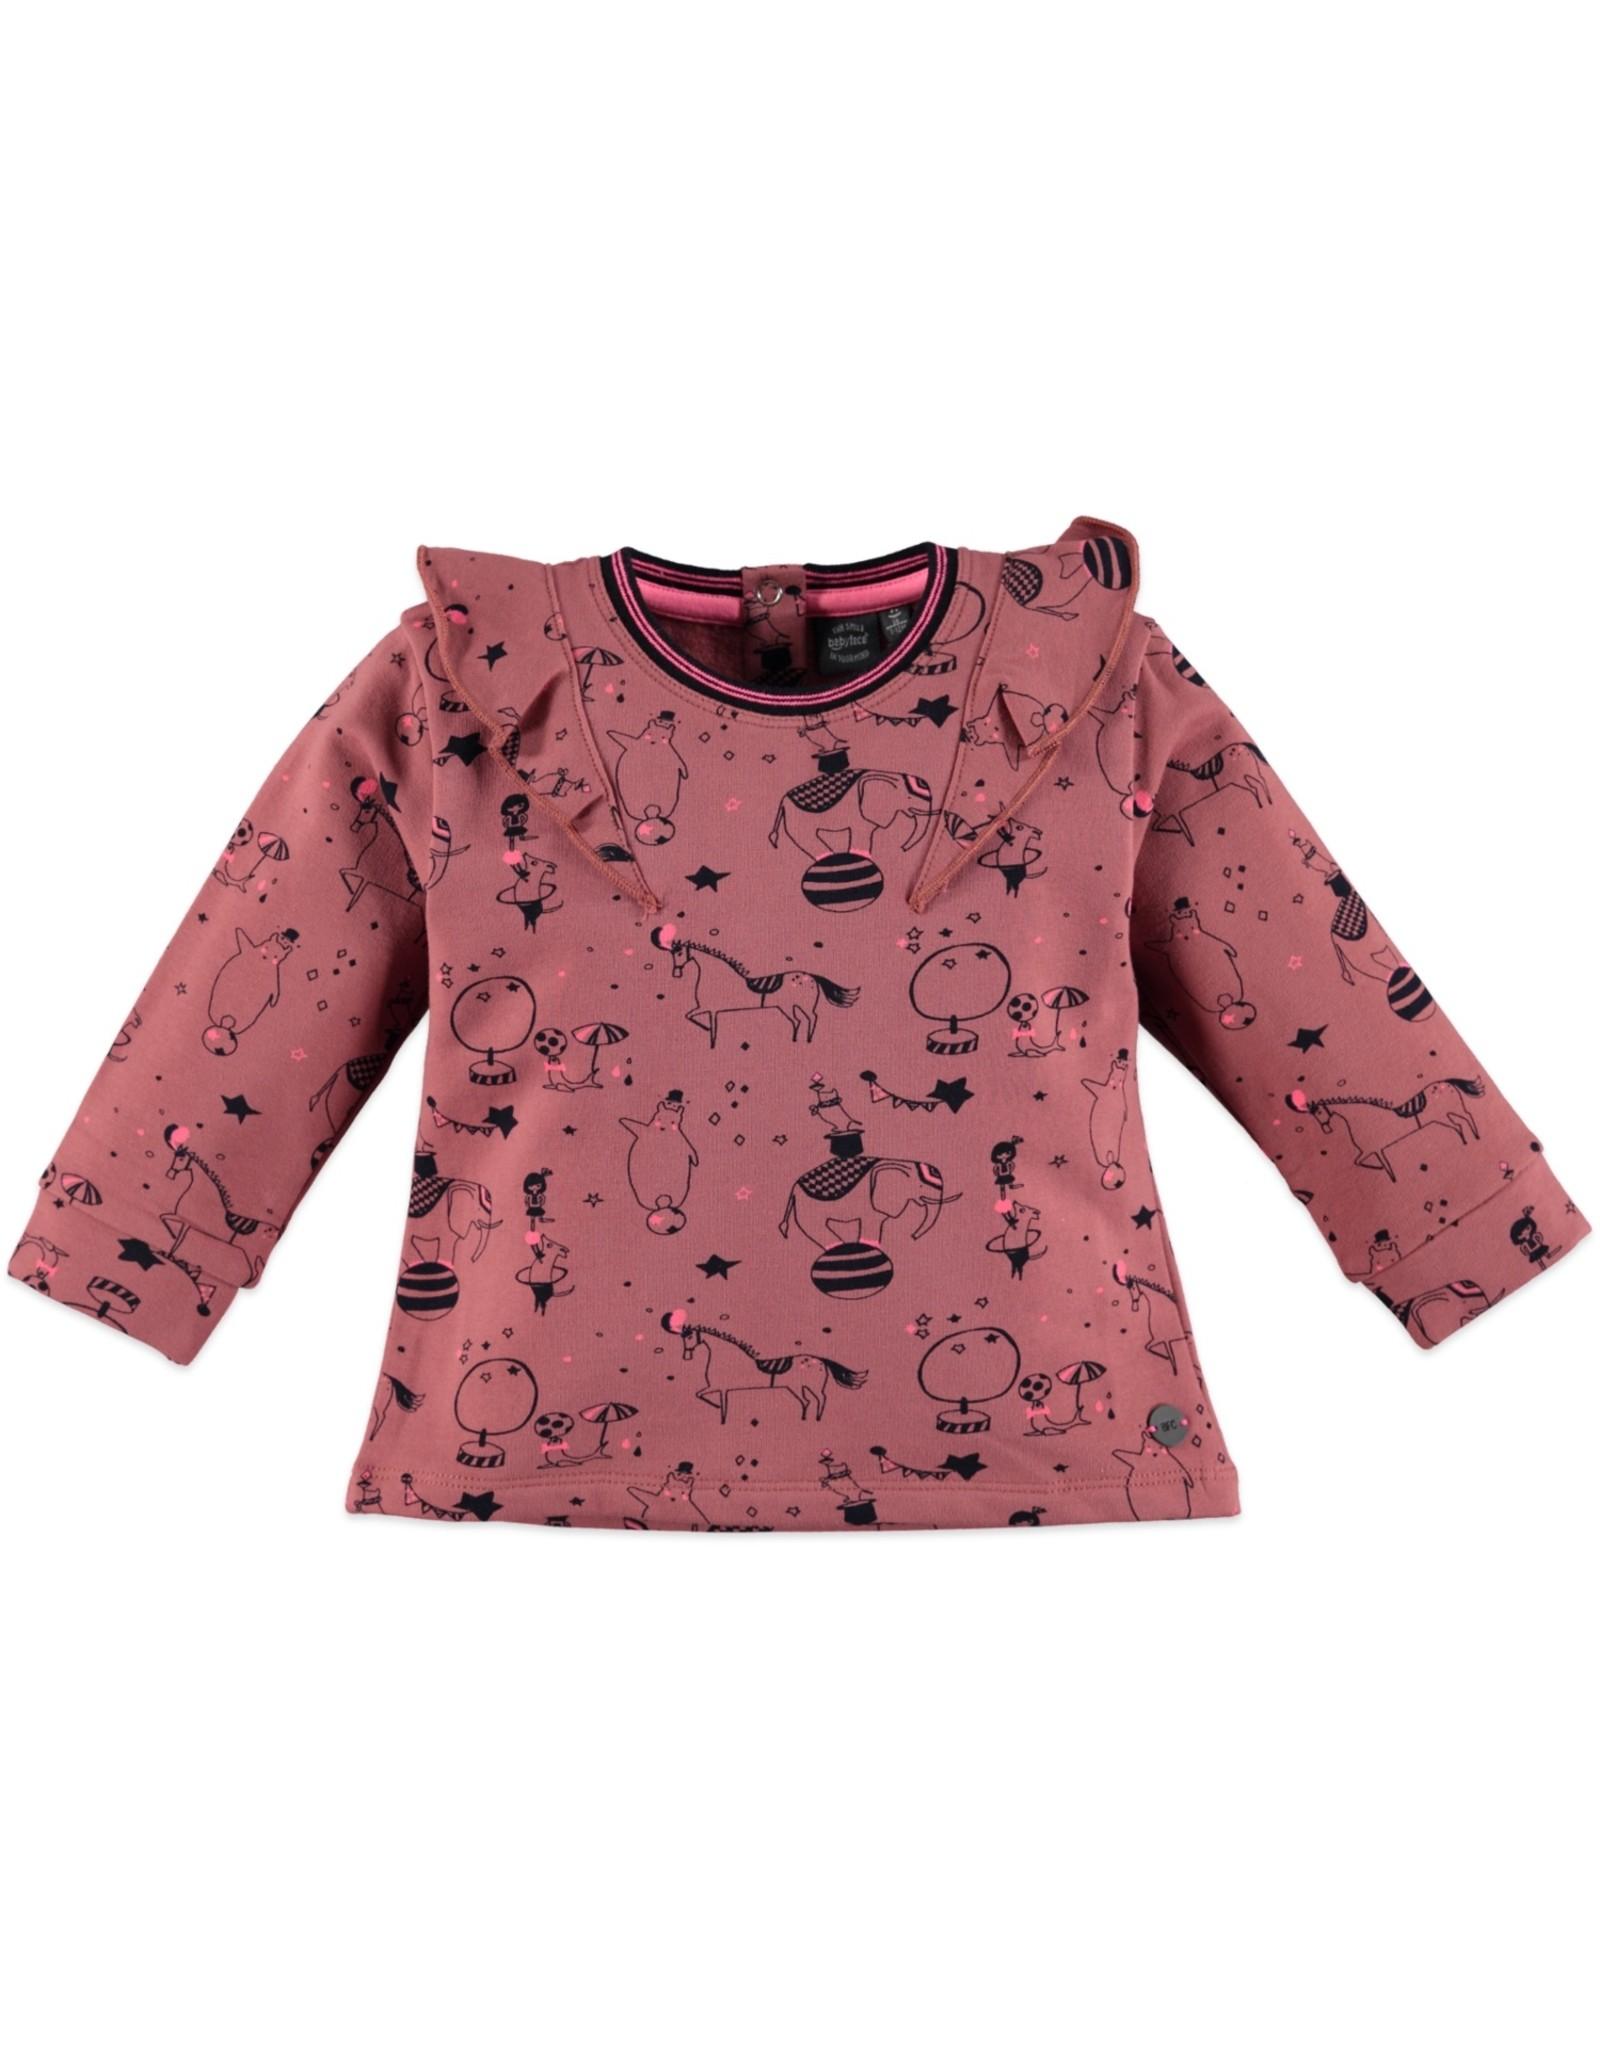 Babyface girls sweatshirt/dusty rose